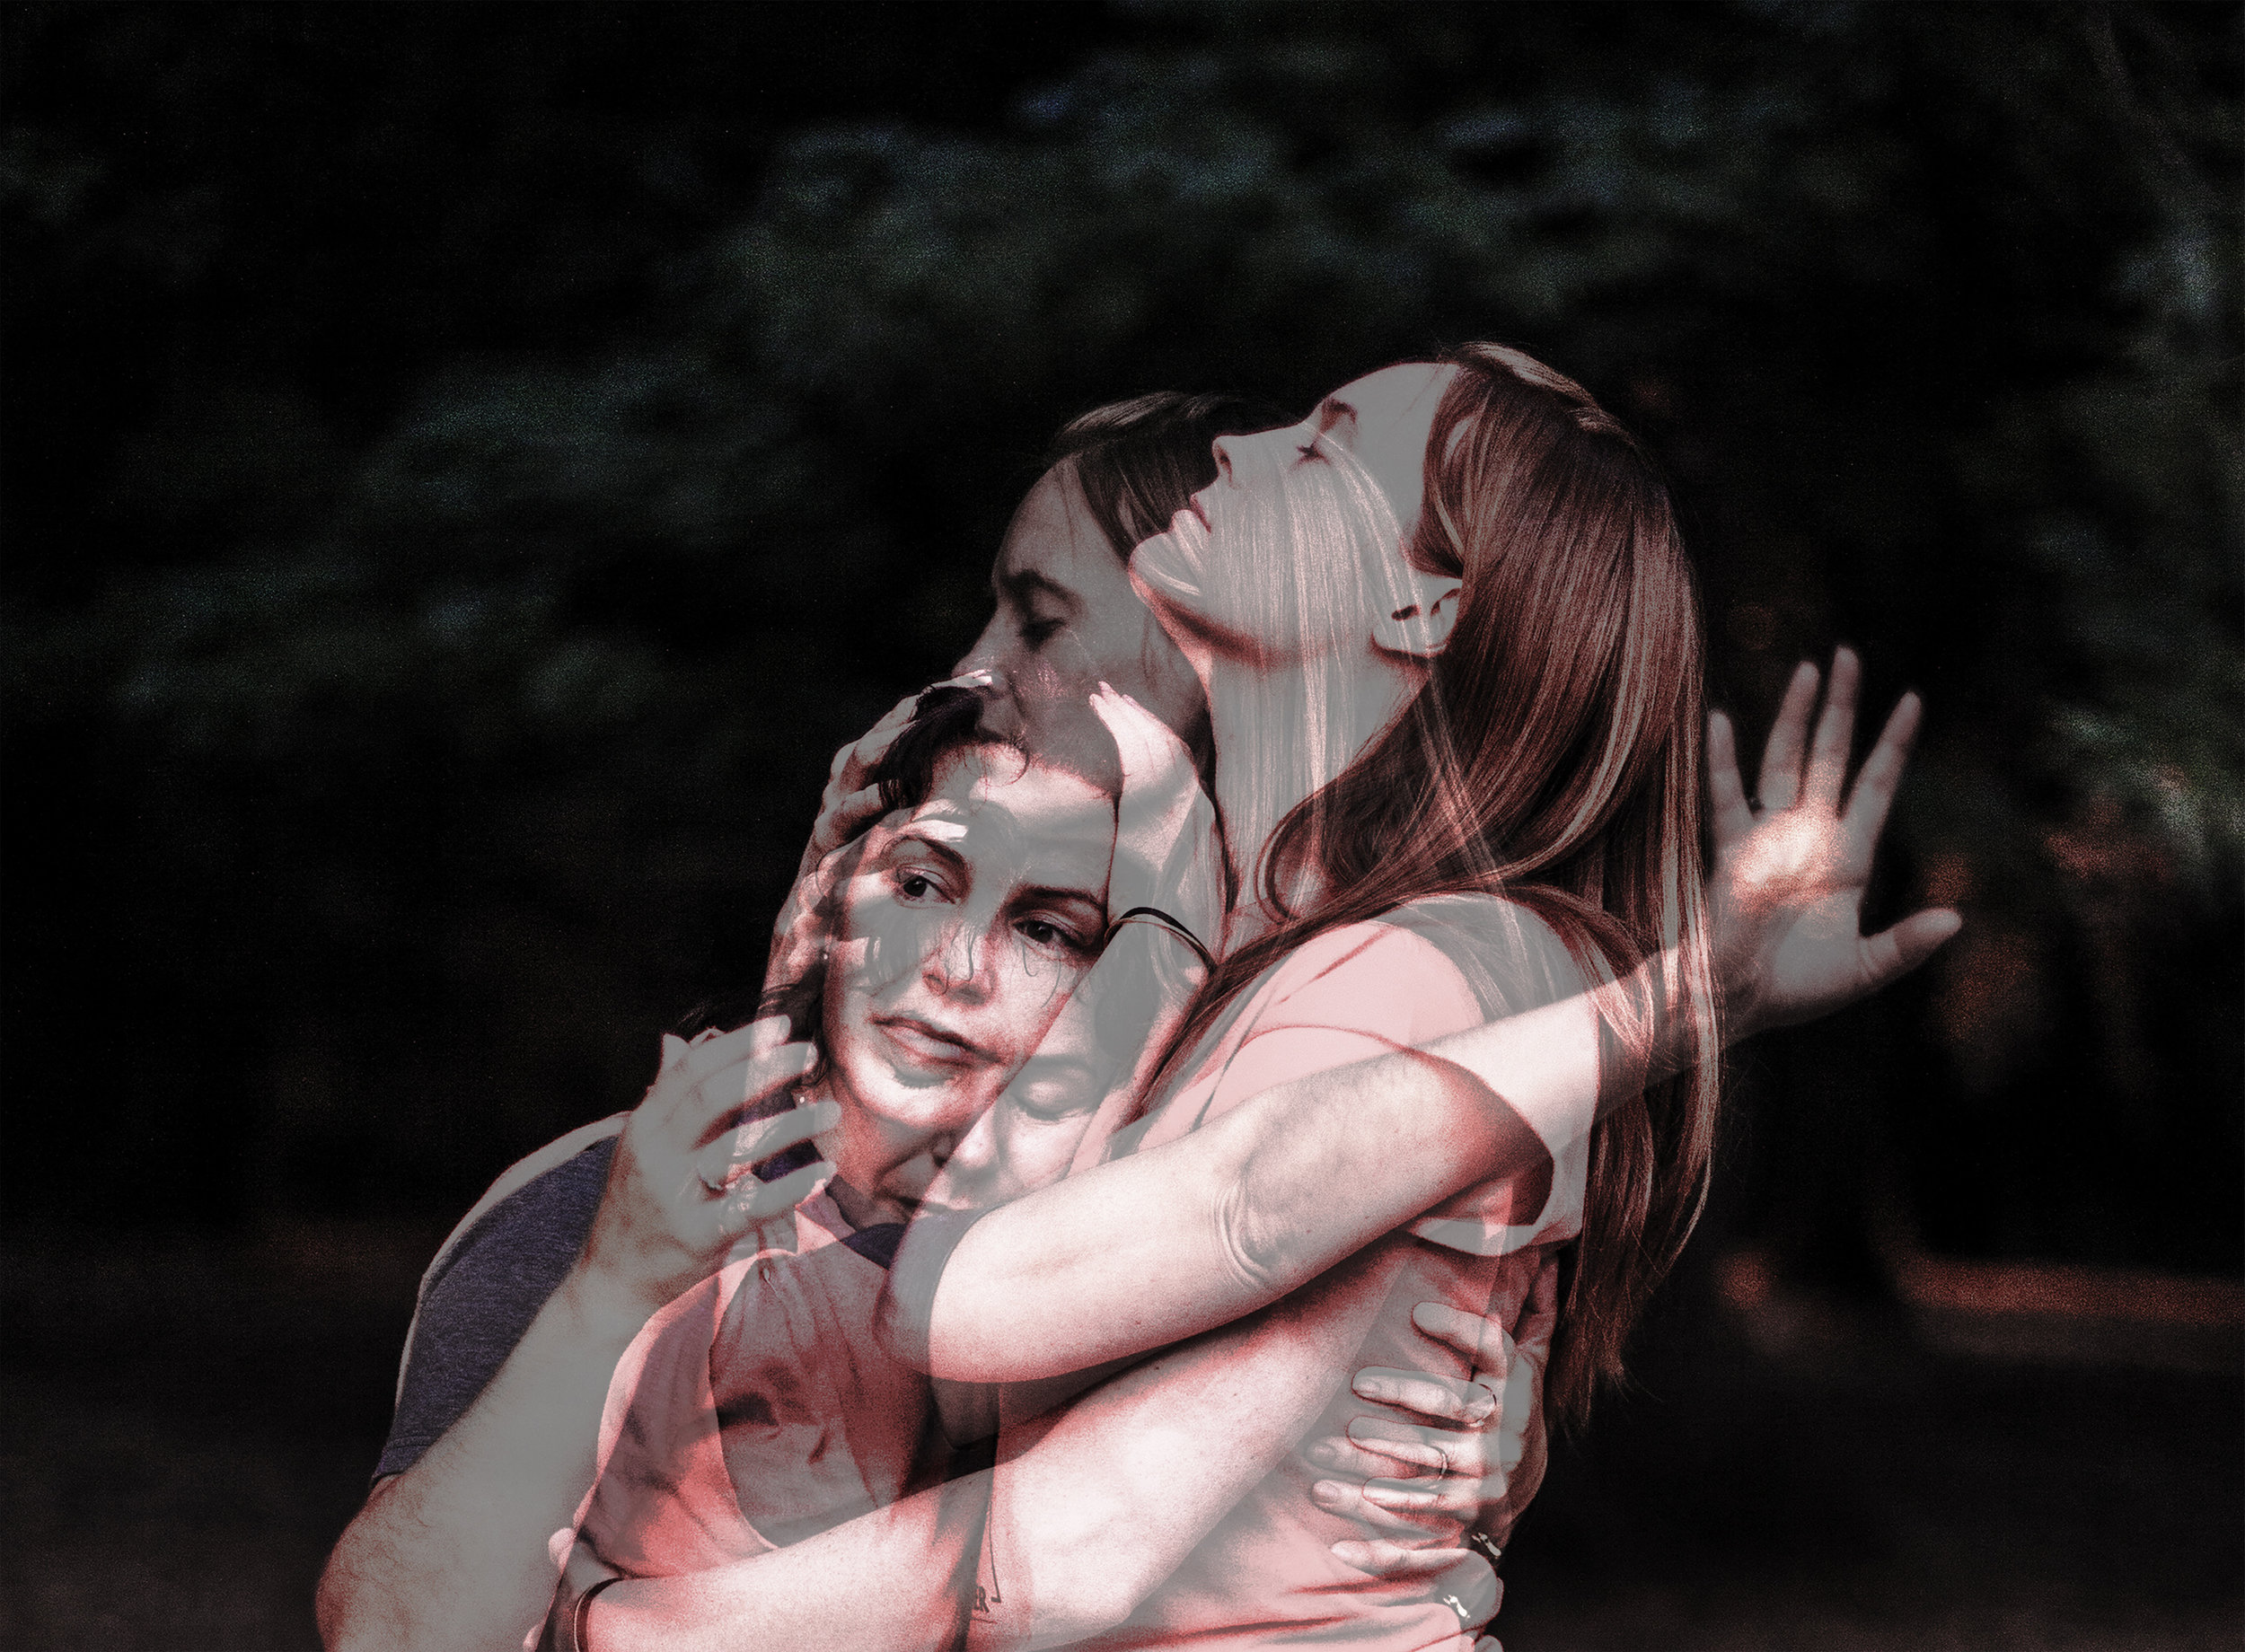 Hand2Mouth_Psychic Utopia_Liz Hayden & Sascha Blocker Close Up_Large File_Mishima Photography_Marguier Design.jpg